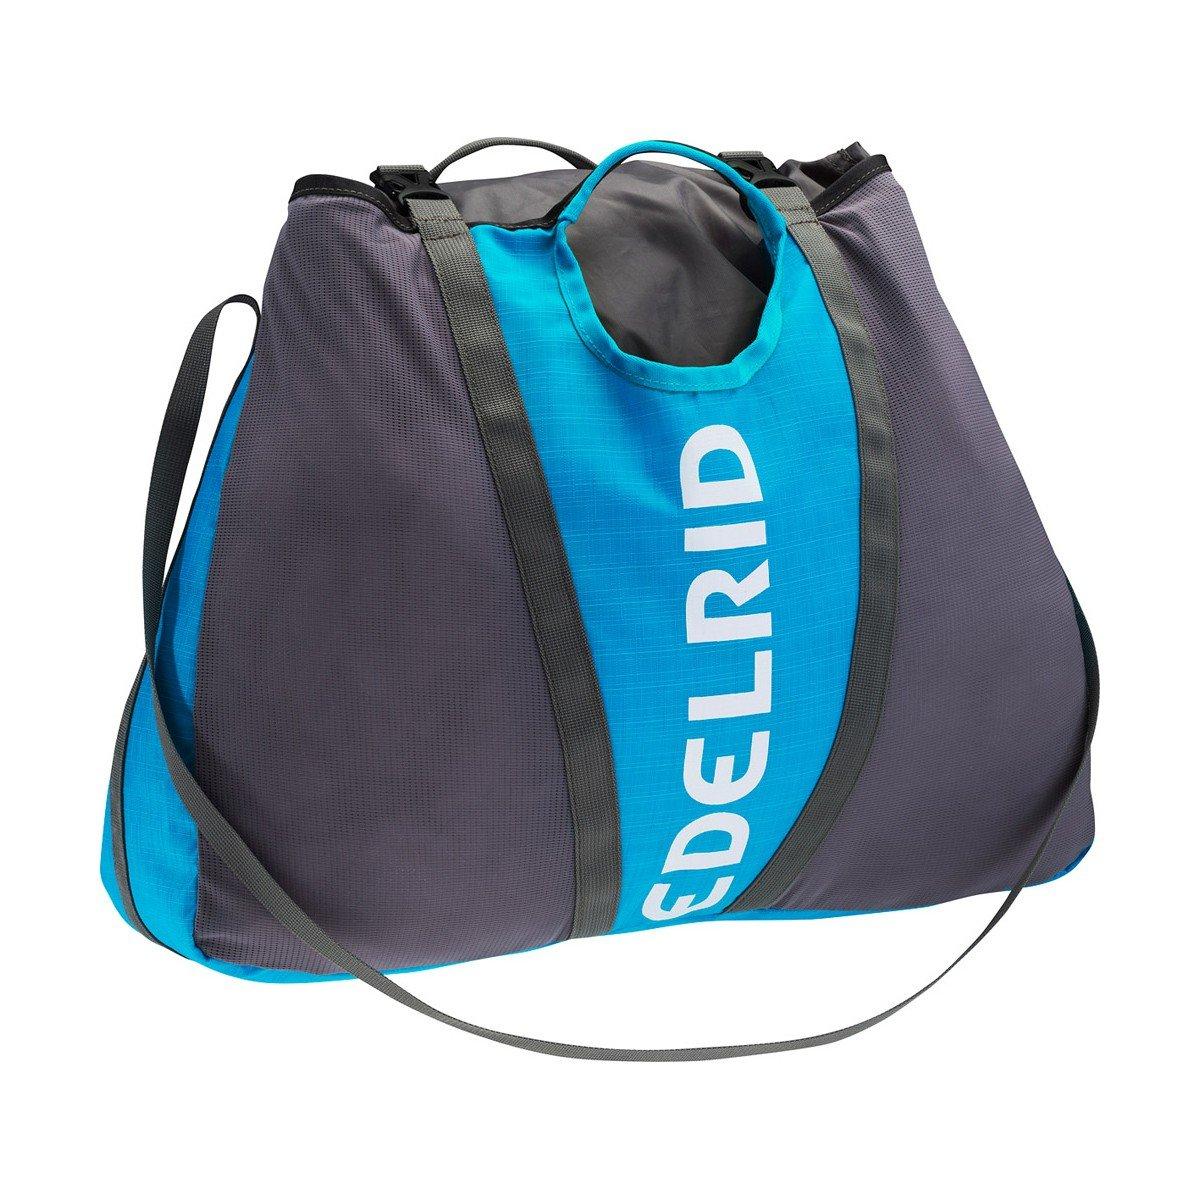 Amazon.com: Edelrid – Cuerda Vrap Bolsa, icemint: Sports ...